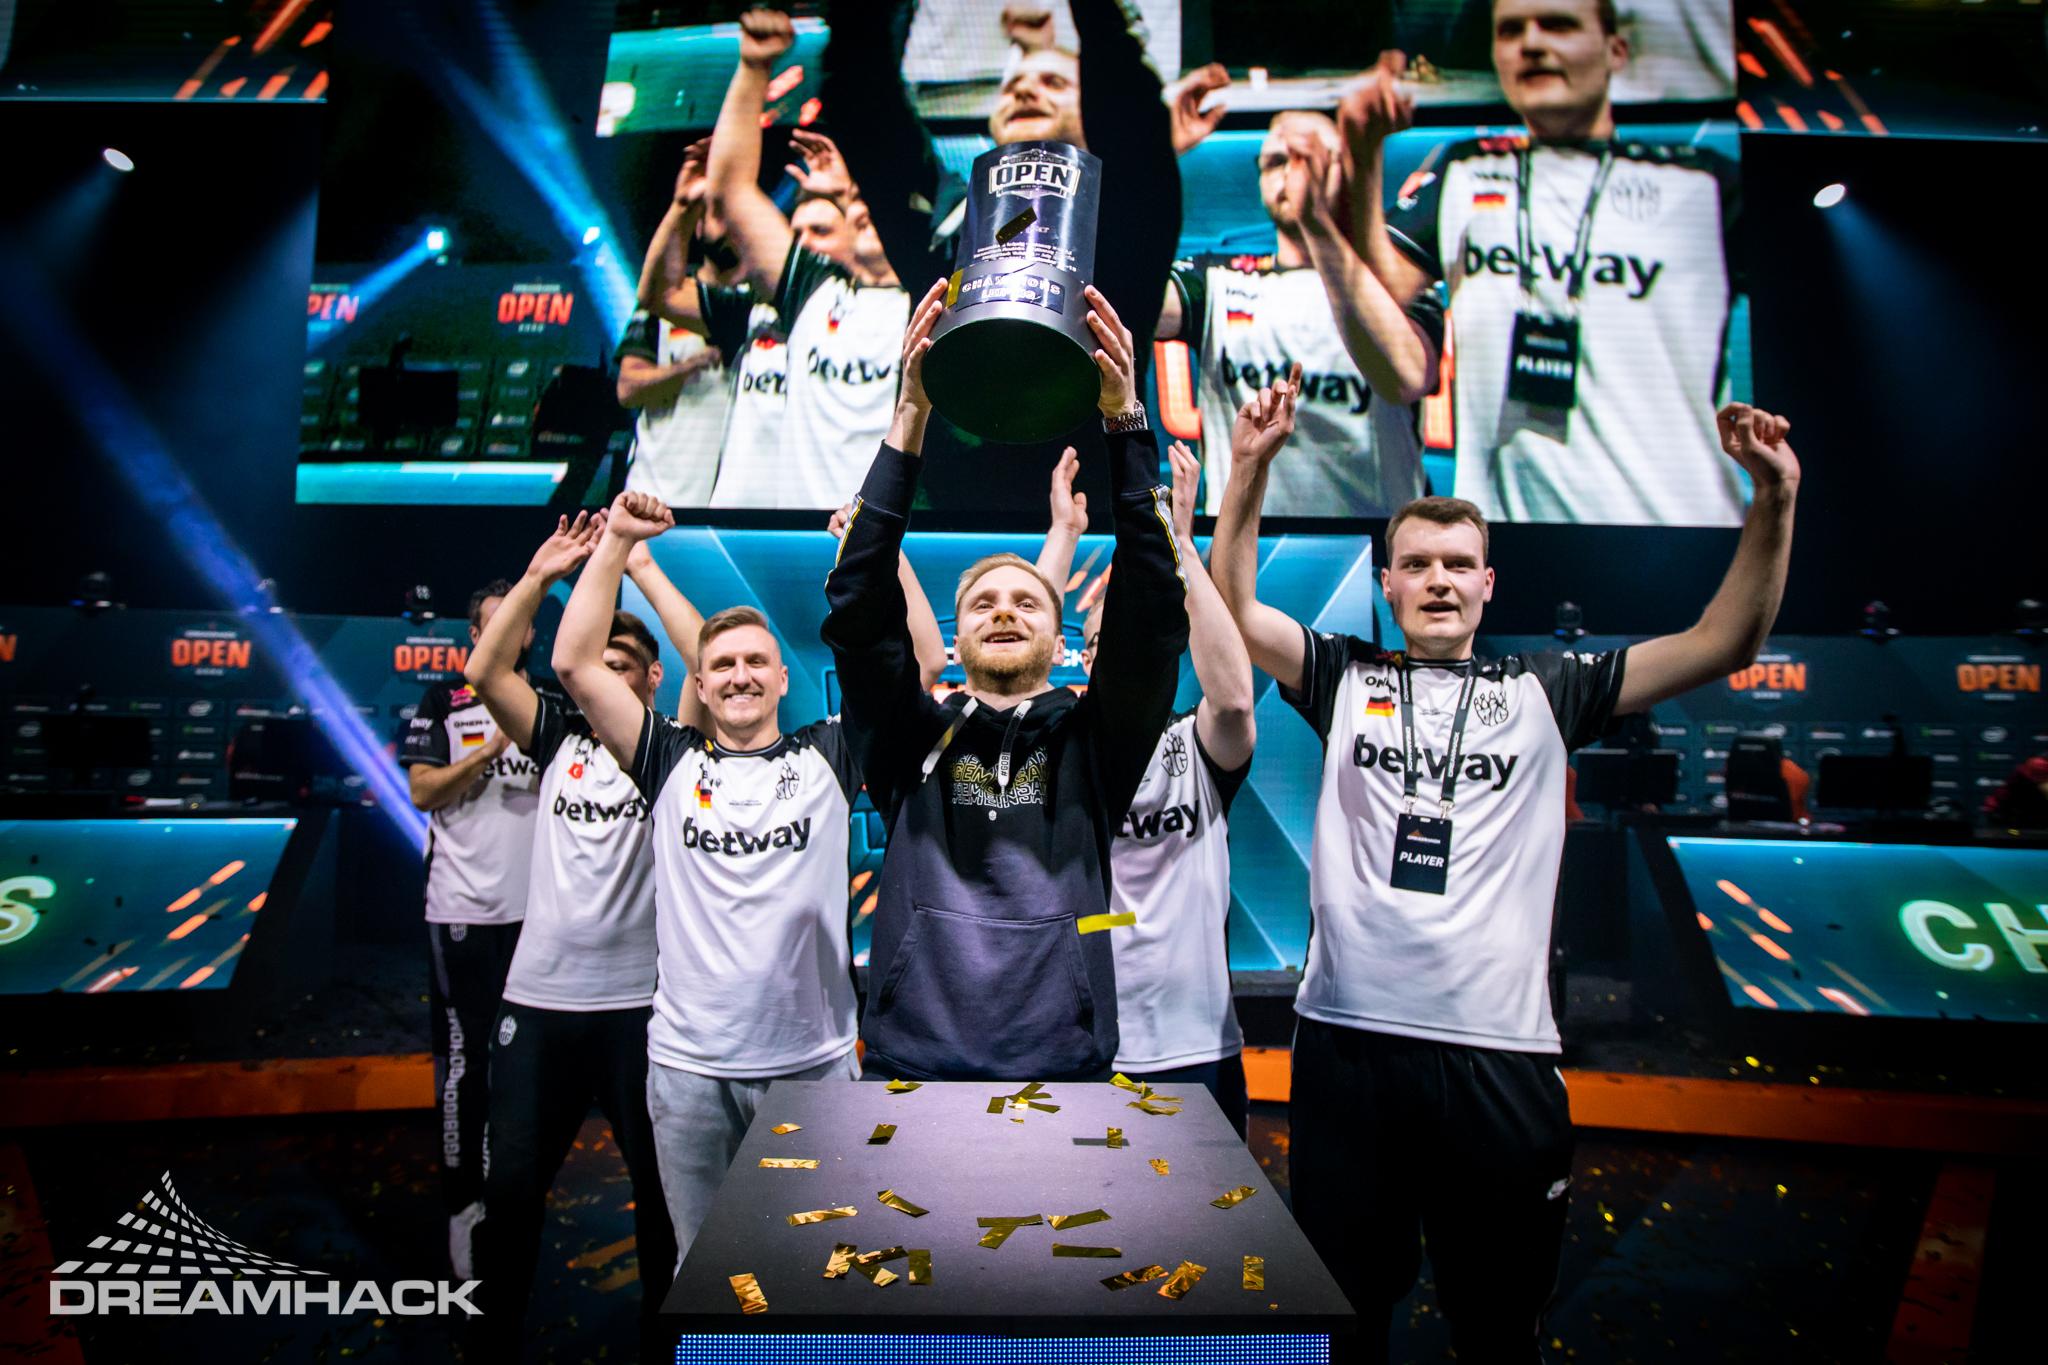 BIG win Dreamhack Leipzig 2020